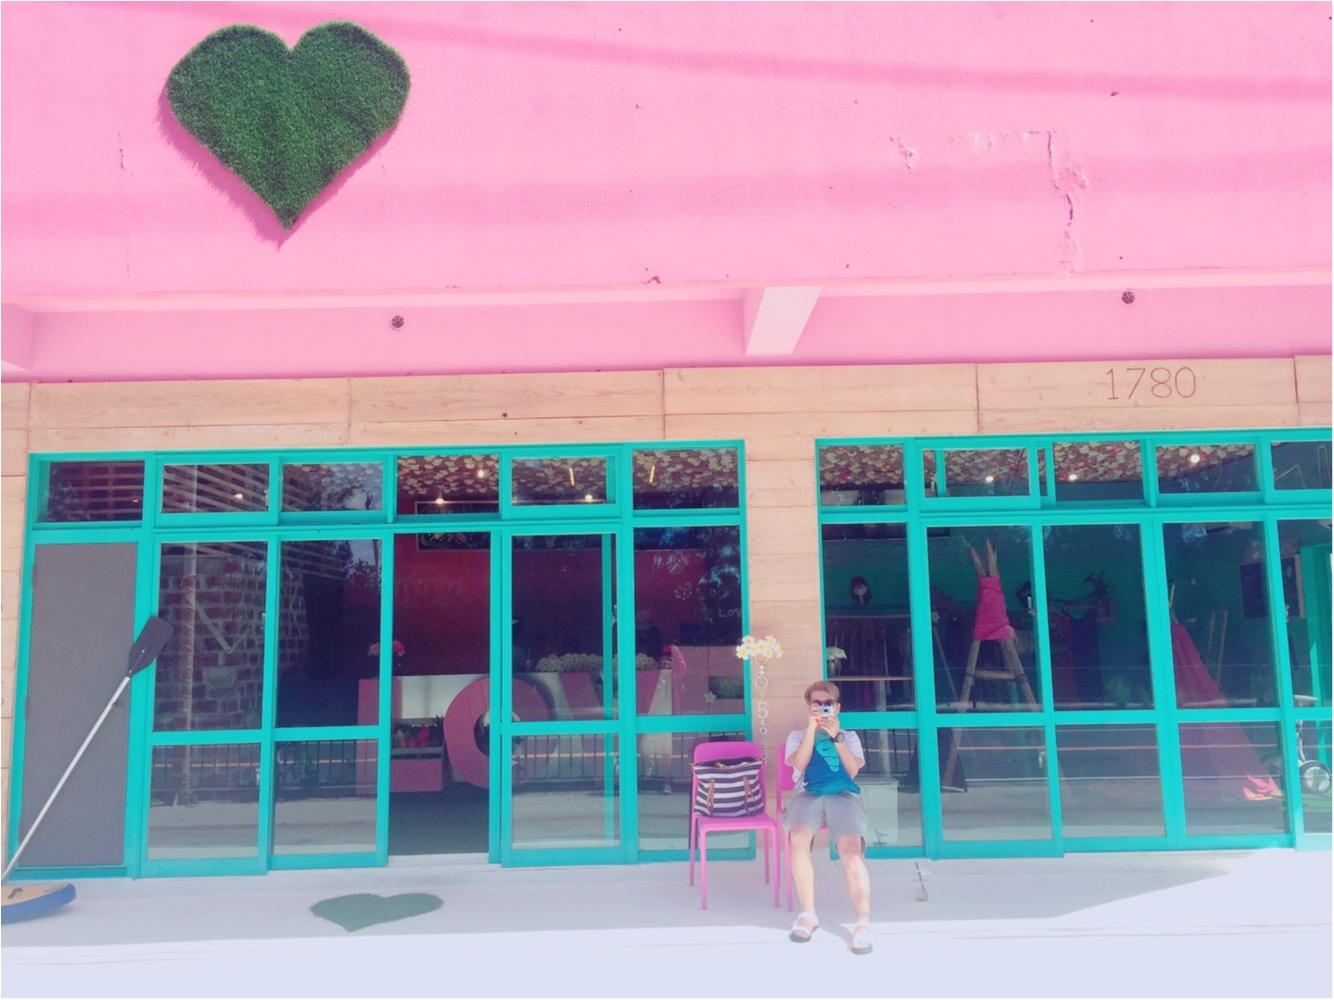 【TRIP】ほんとうは教えたくない!超フォトジェニック♡沖縄で1番すきなカフェ♡ MAGENTA n blue ♡_2